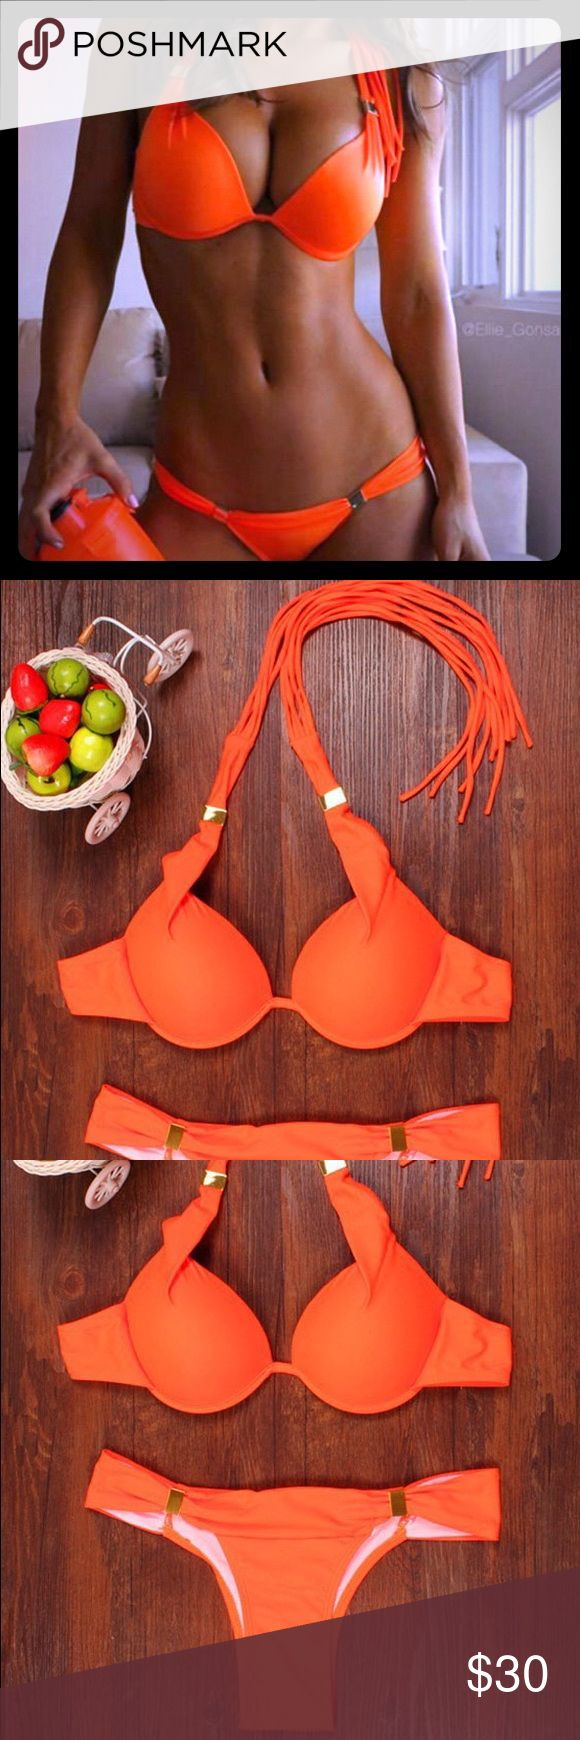 NWT Orange fringe bikini Swimsuit Size M-L Just got these in.. New in package. Bright orange fringe bikini. Great summer color.  Smoke/Pet free home. Fast shipping... Swim Bikinis